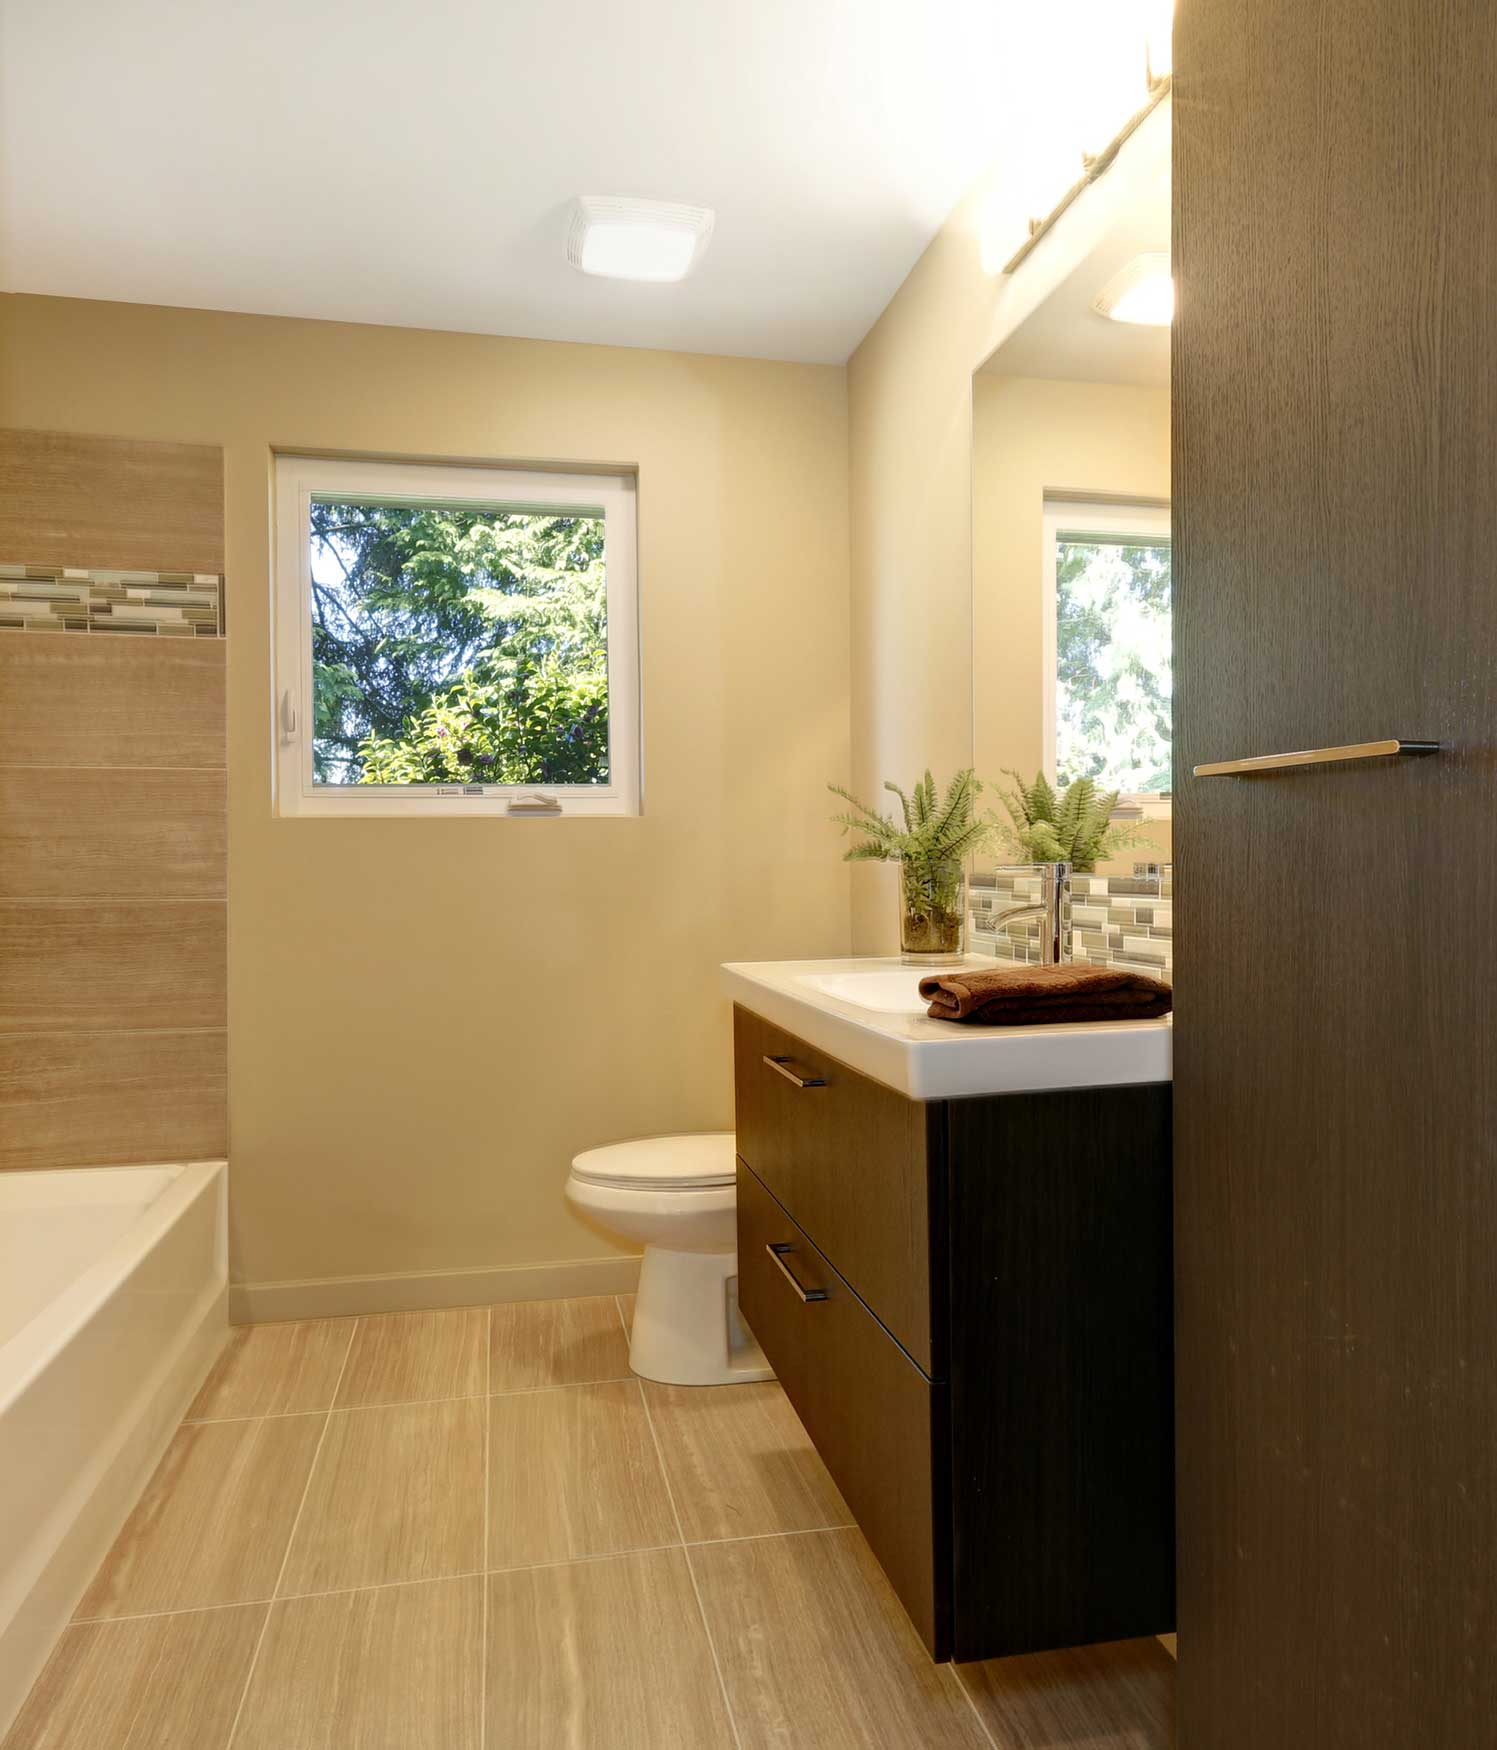 dark wooden cabinet in a bathroom